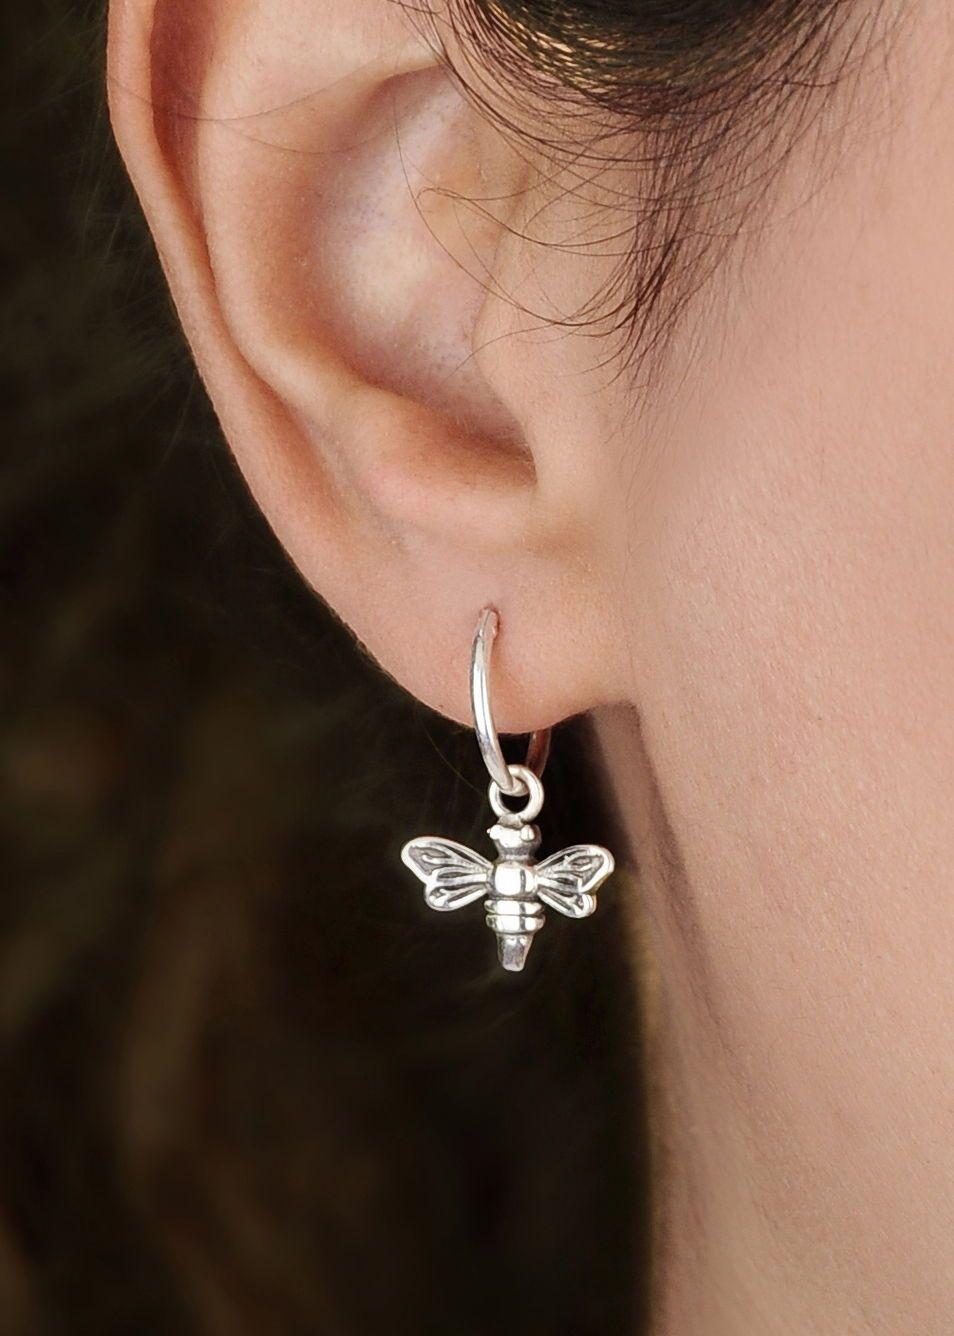 Handmade. Tiny Sun Dangle Earrings.Metal earrings.Circle Drop Earrings.Silver.Small earrings.Clip On Earrings.Bridal.Floral.Sun Charm.Gift